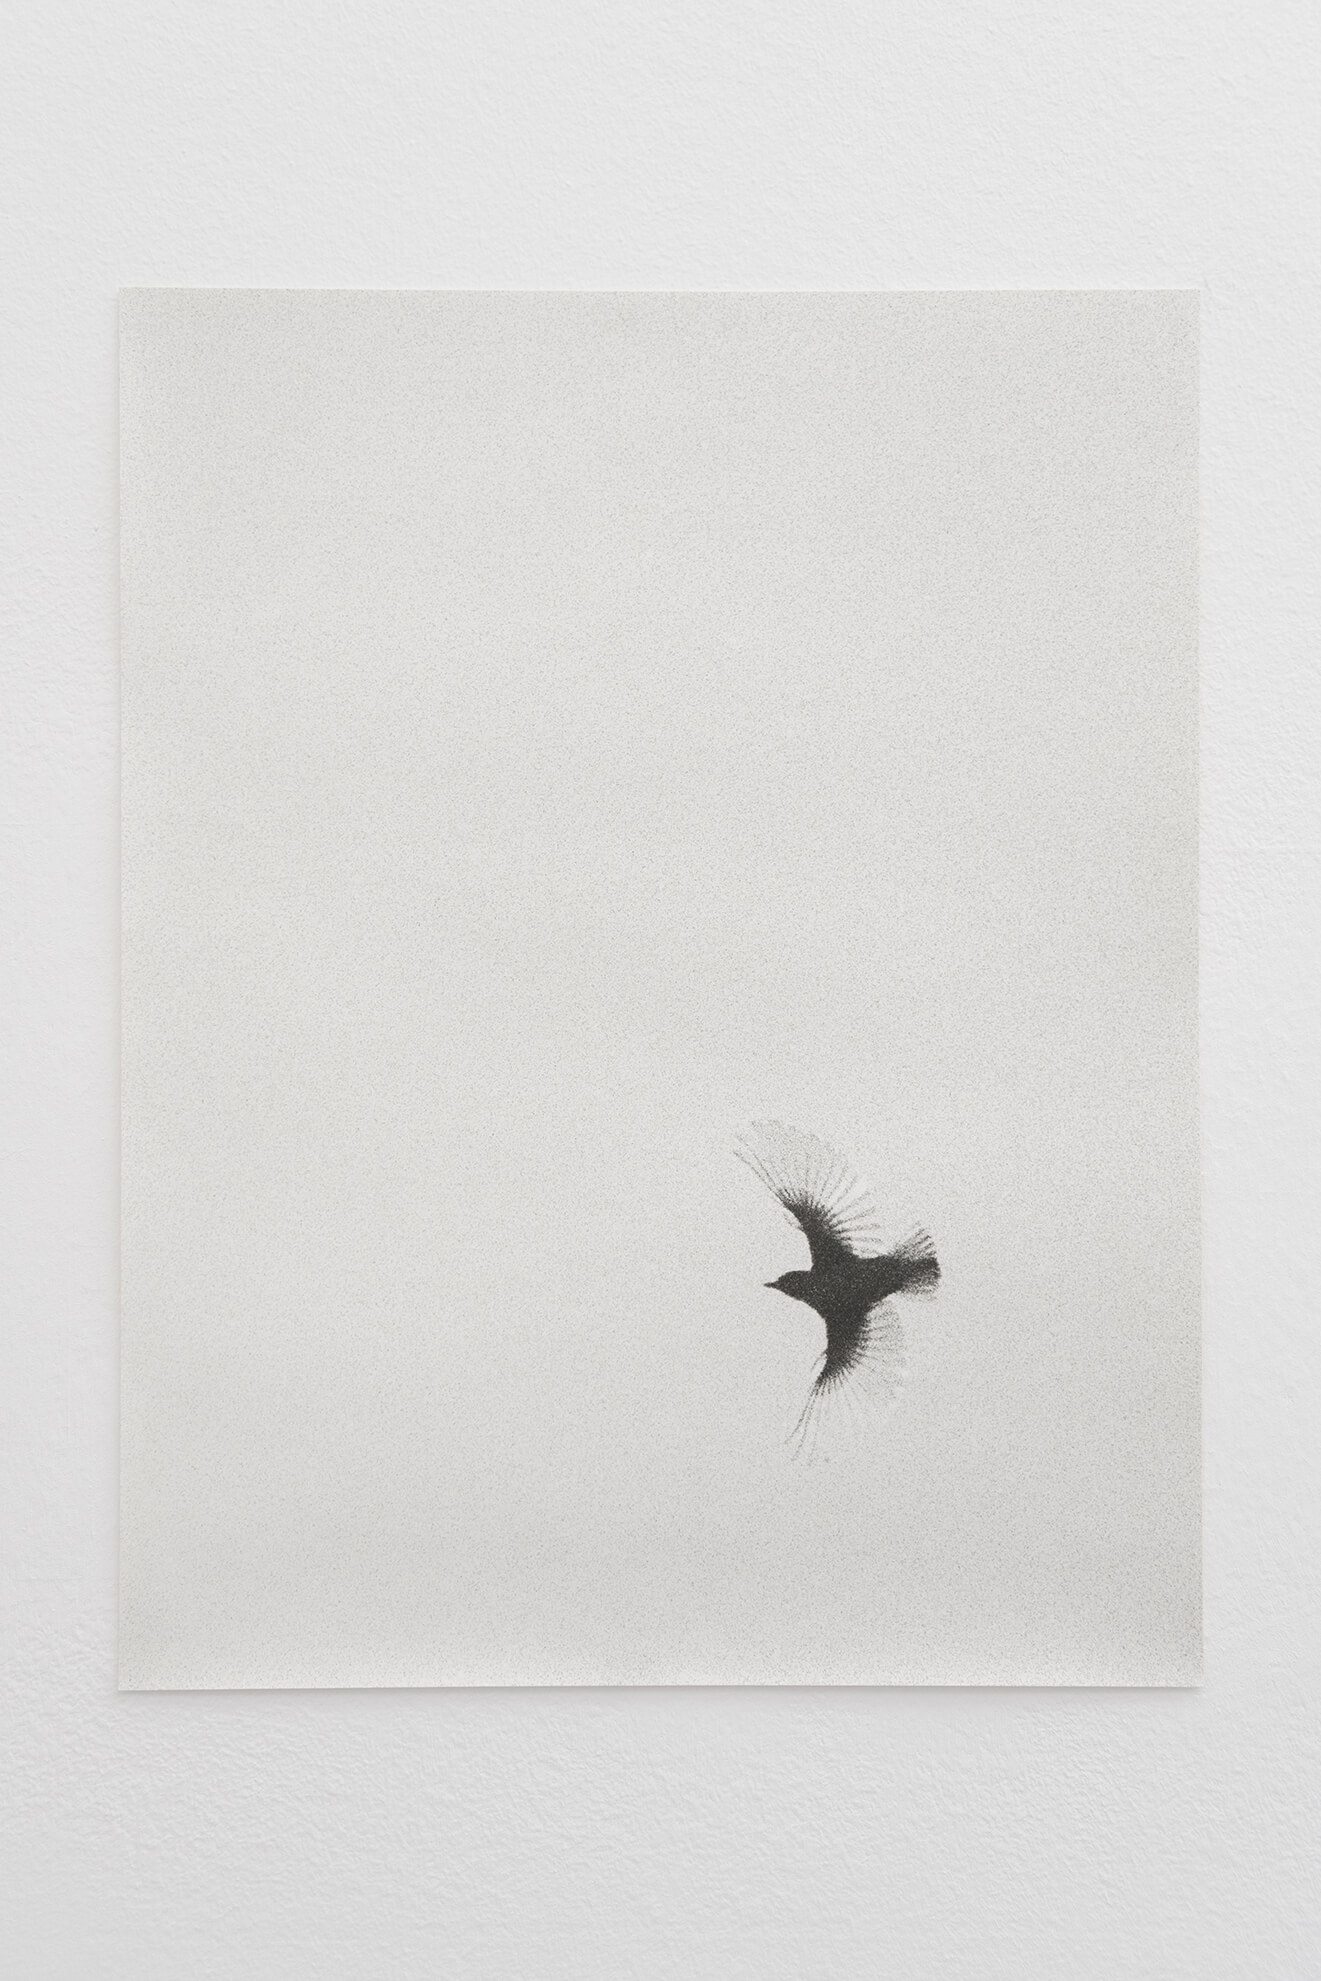 Musciaga I, 2019-2021 | JOCHEN LEMPERT: VISIBLE LIGHT | ProjecteSD